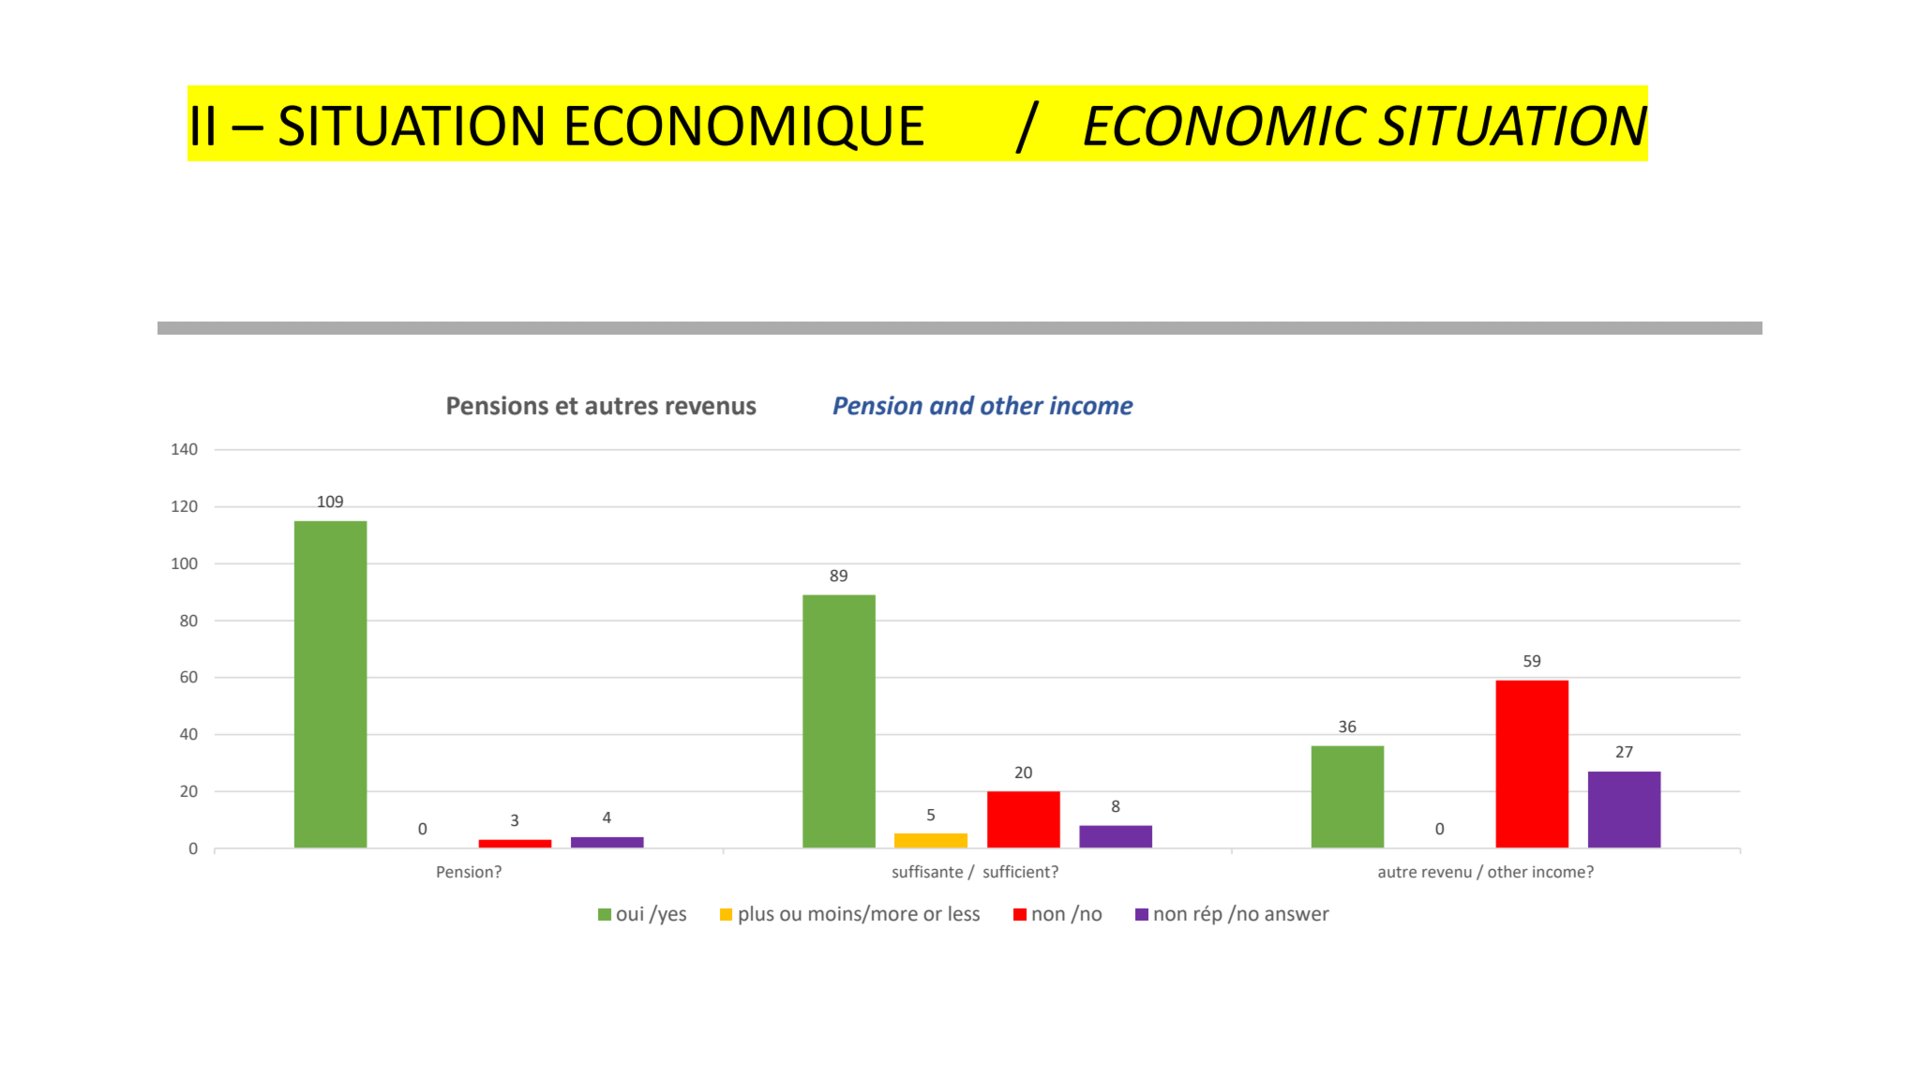 Economic sitaution